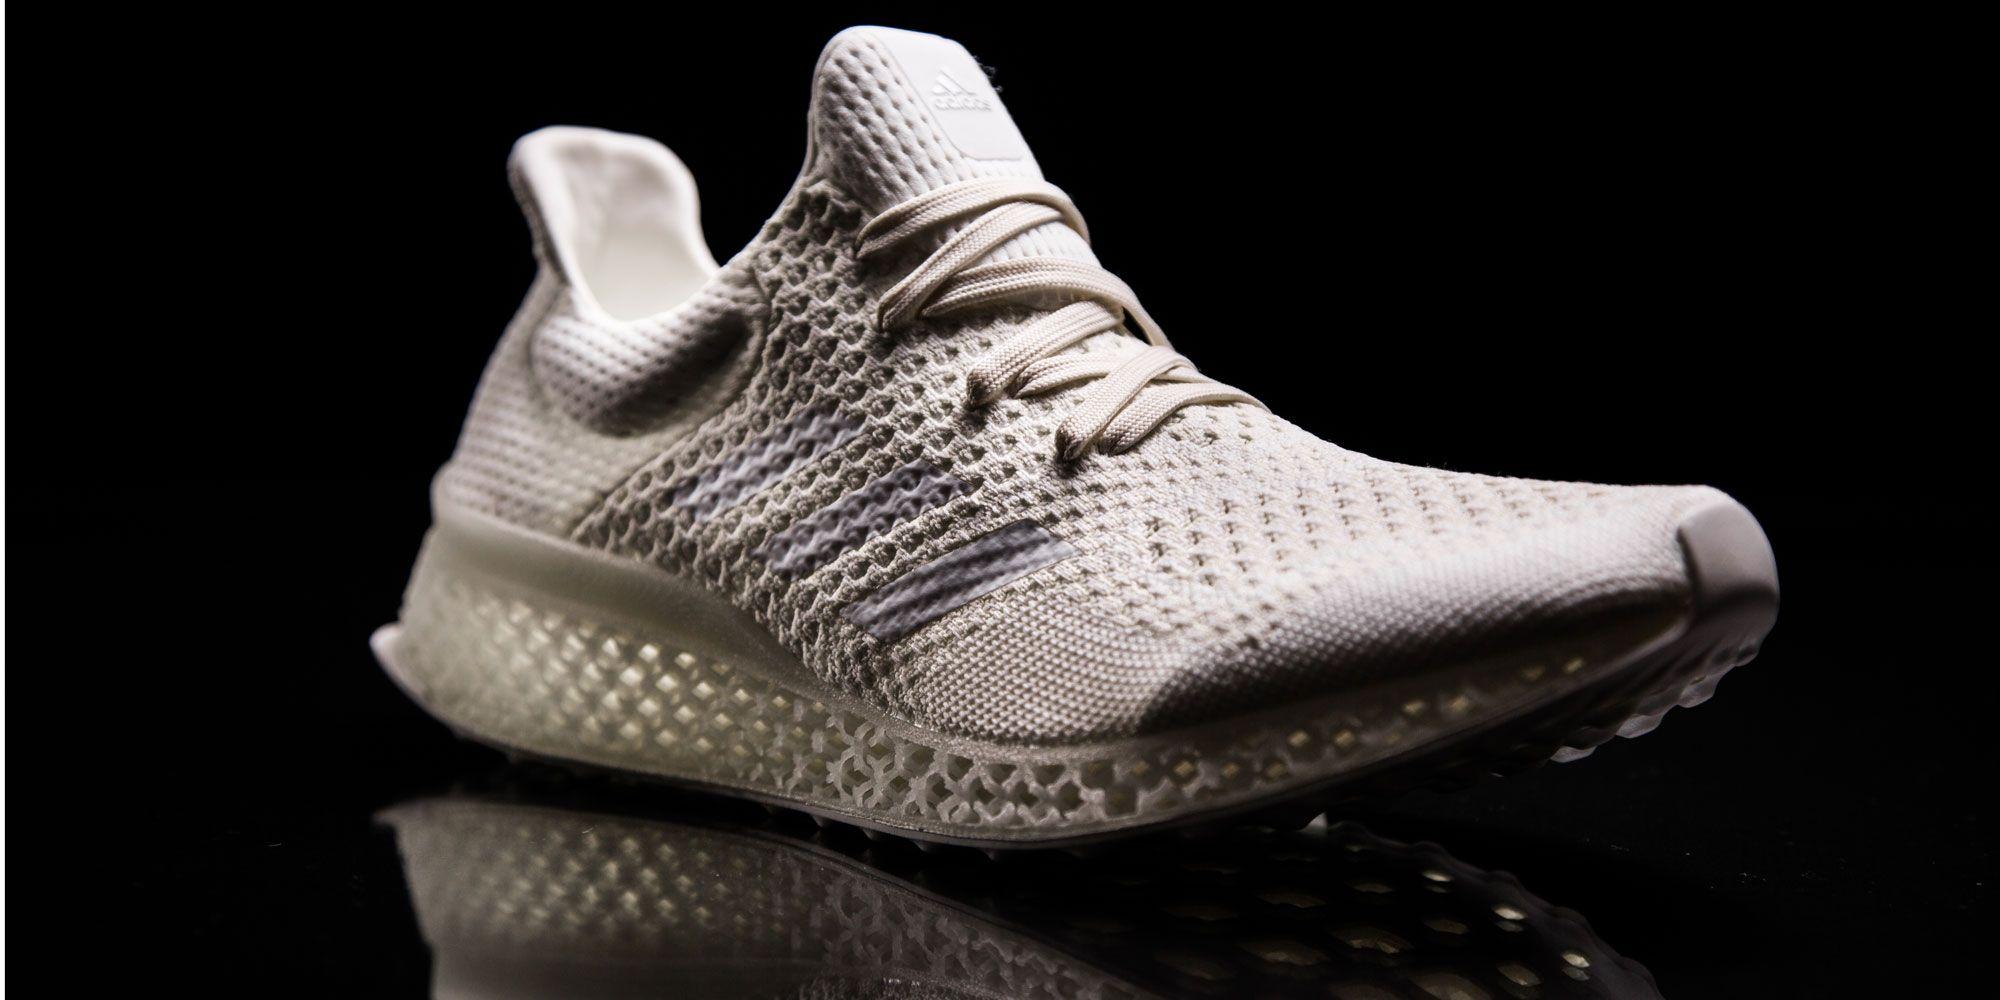 1444242018 Adidas Futurecraft Jpg